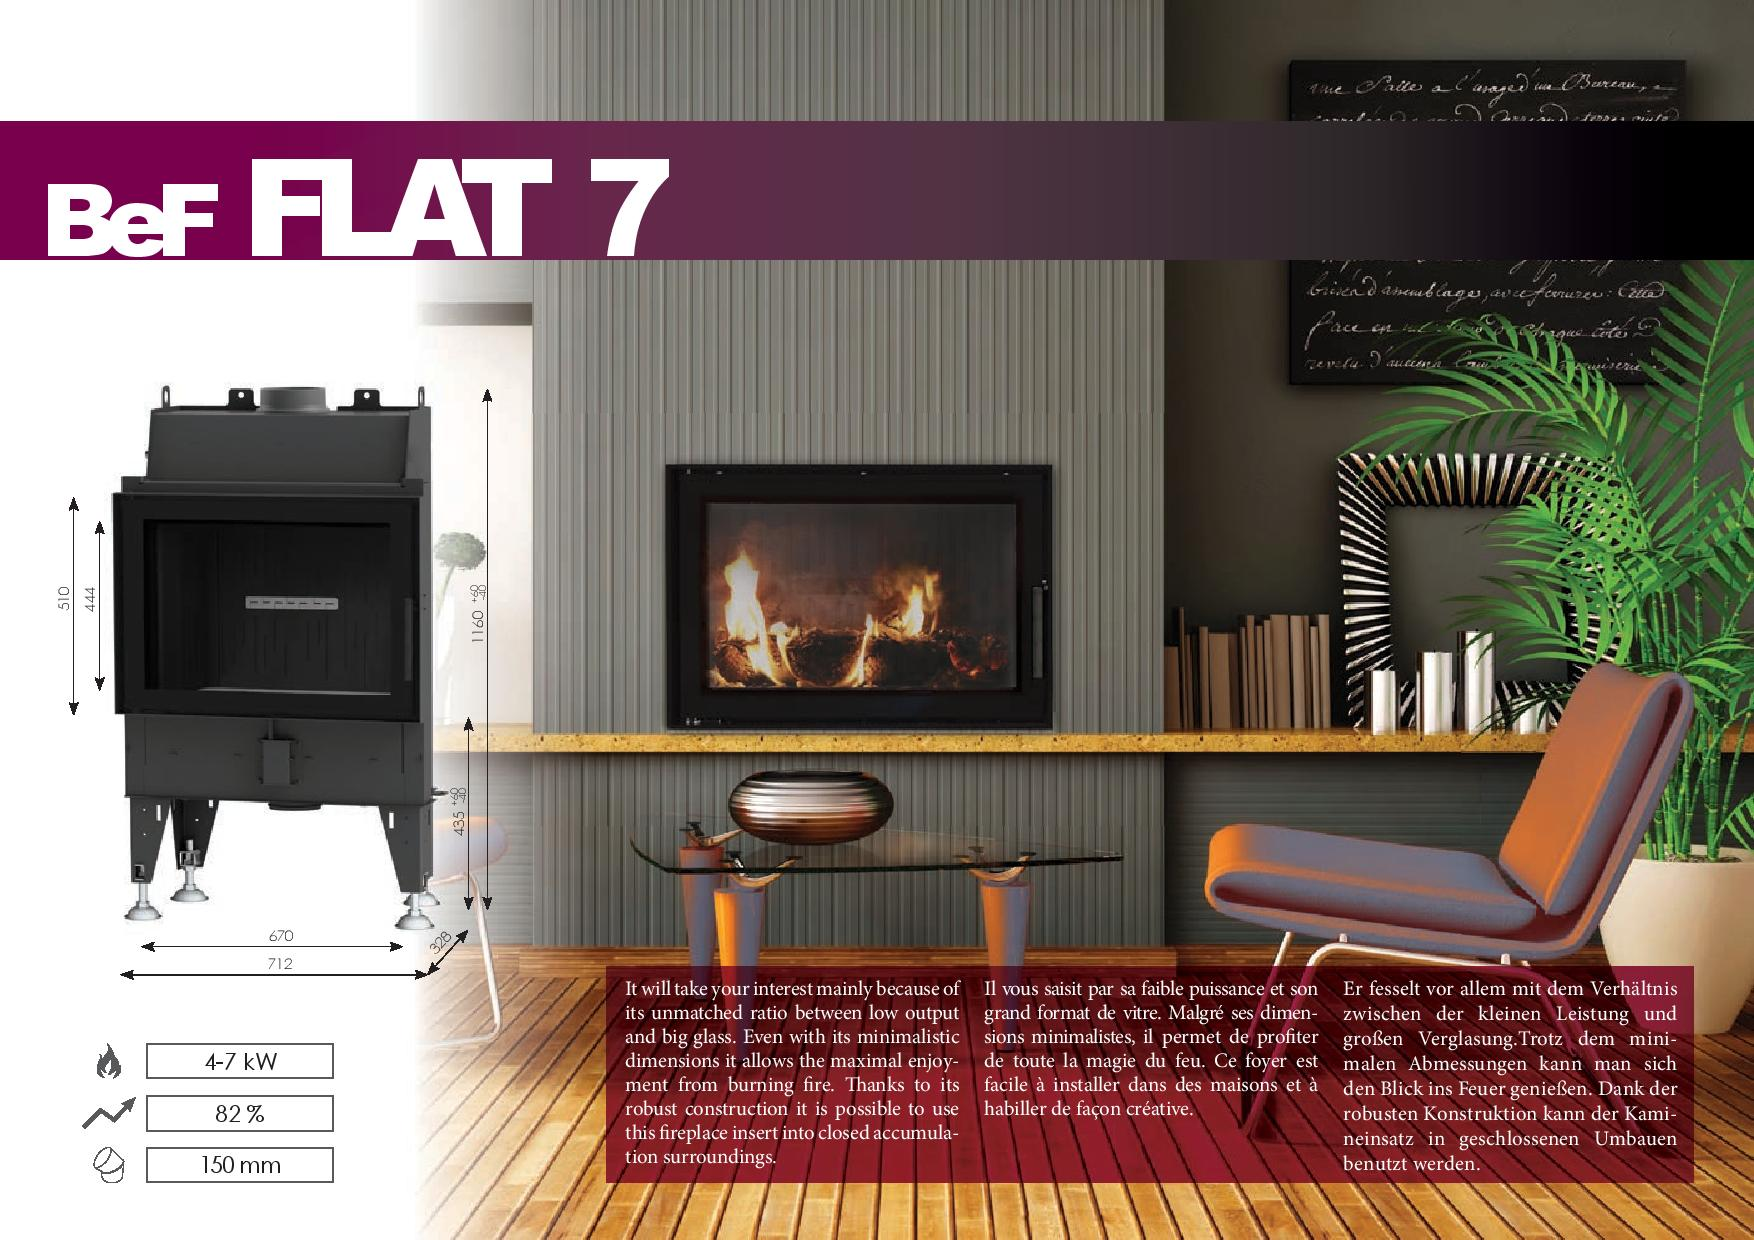 Foyers à bois FLAT BeF HOME 7 kw